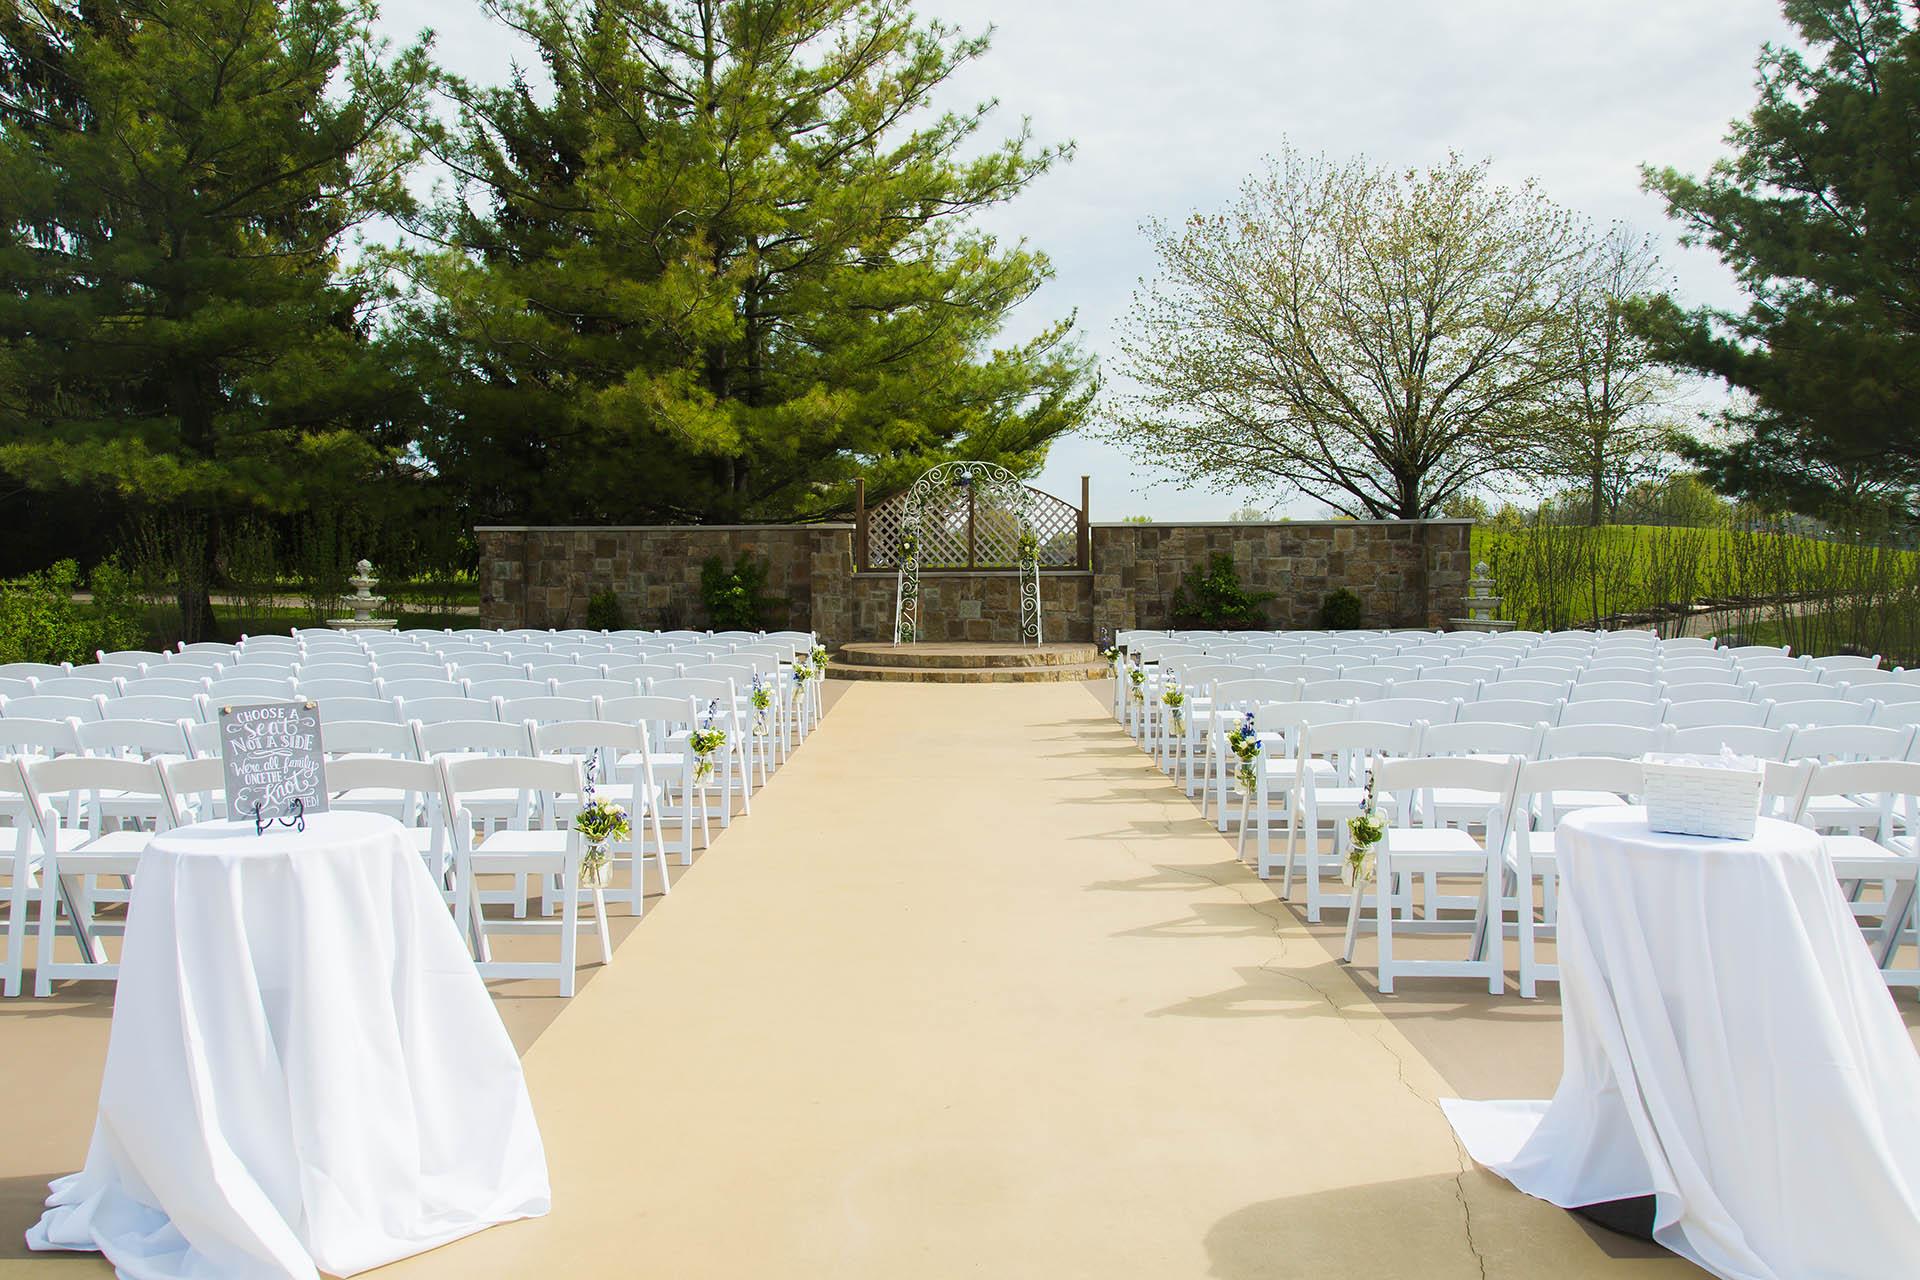 North shore wedgewood weddings wedding ceremony on the terrace at wedgewood weddings north shore north chicago solutioingenieria Gallery